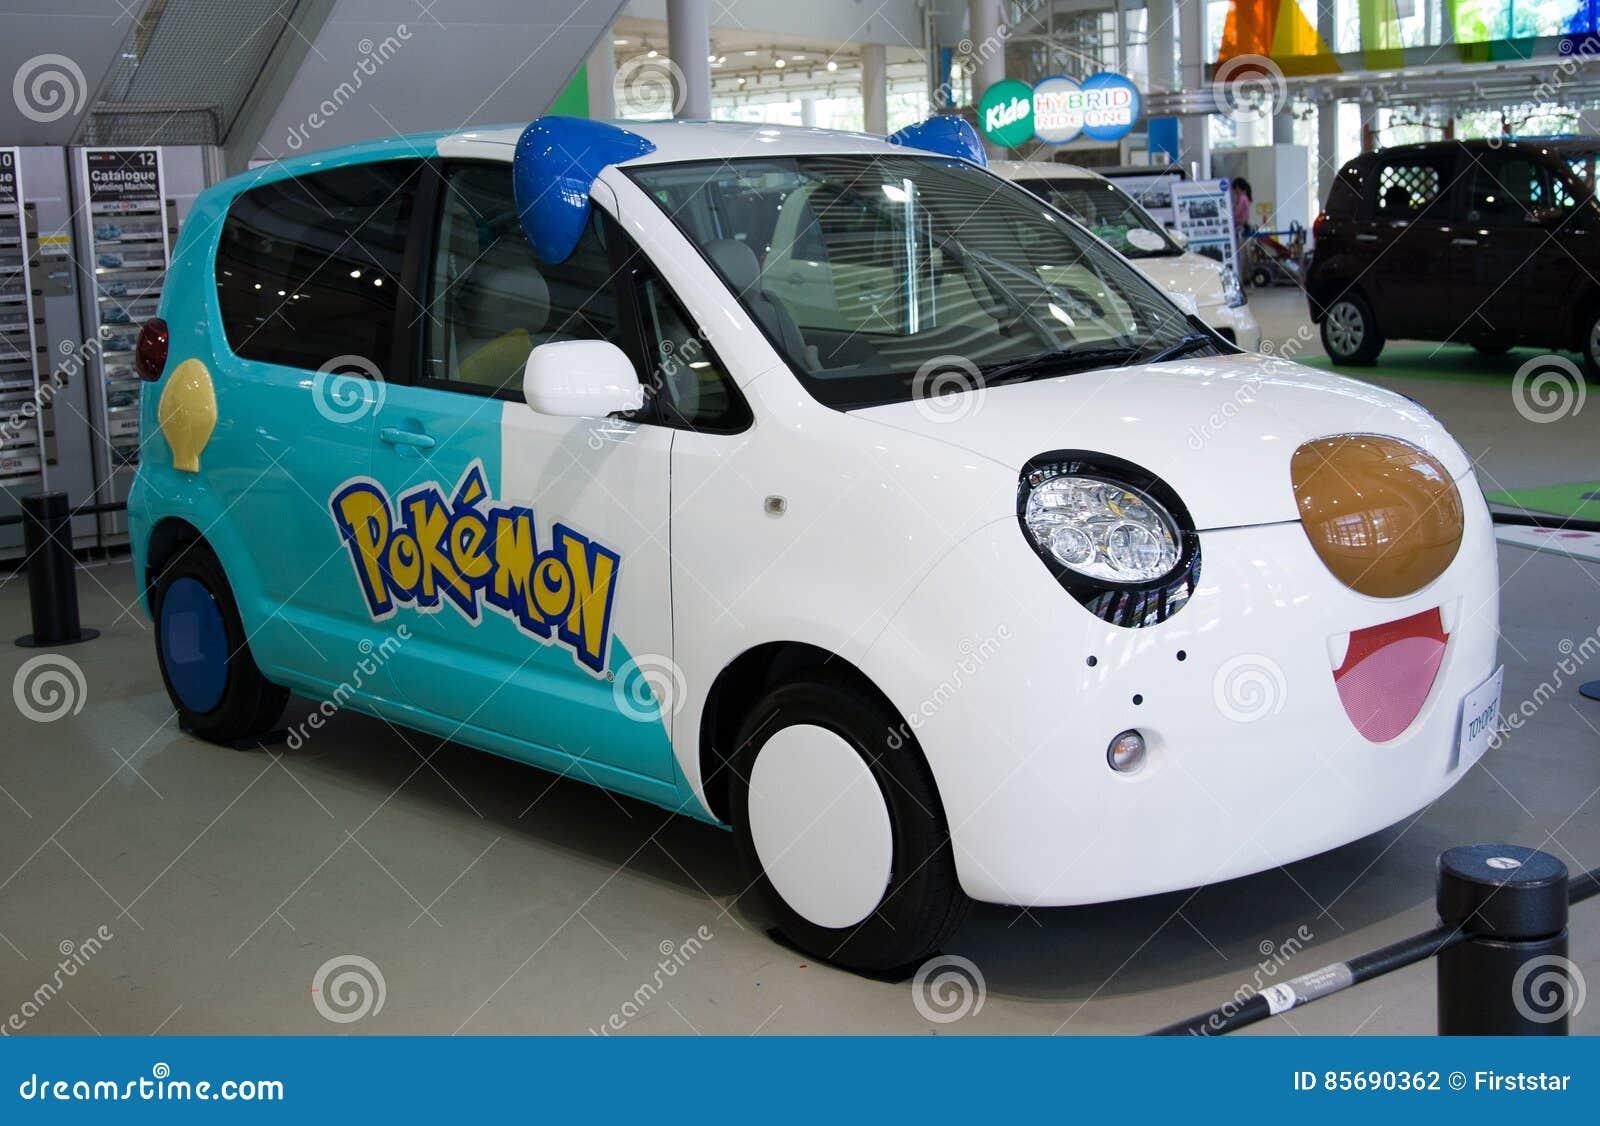 2017 Toyopet Pokemon Toyota Car Japan Editorial Photography